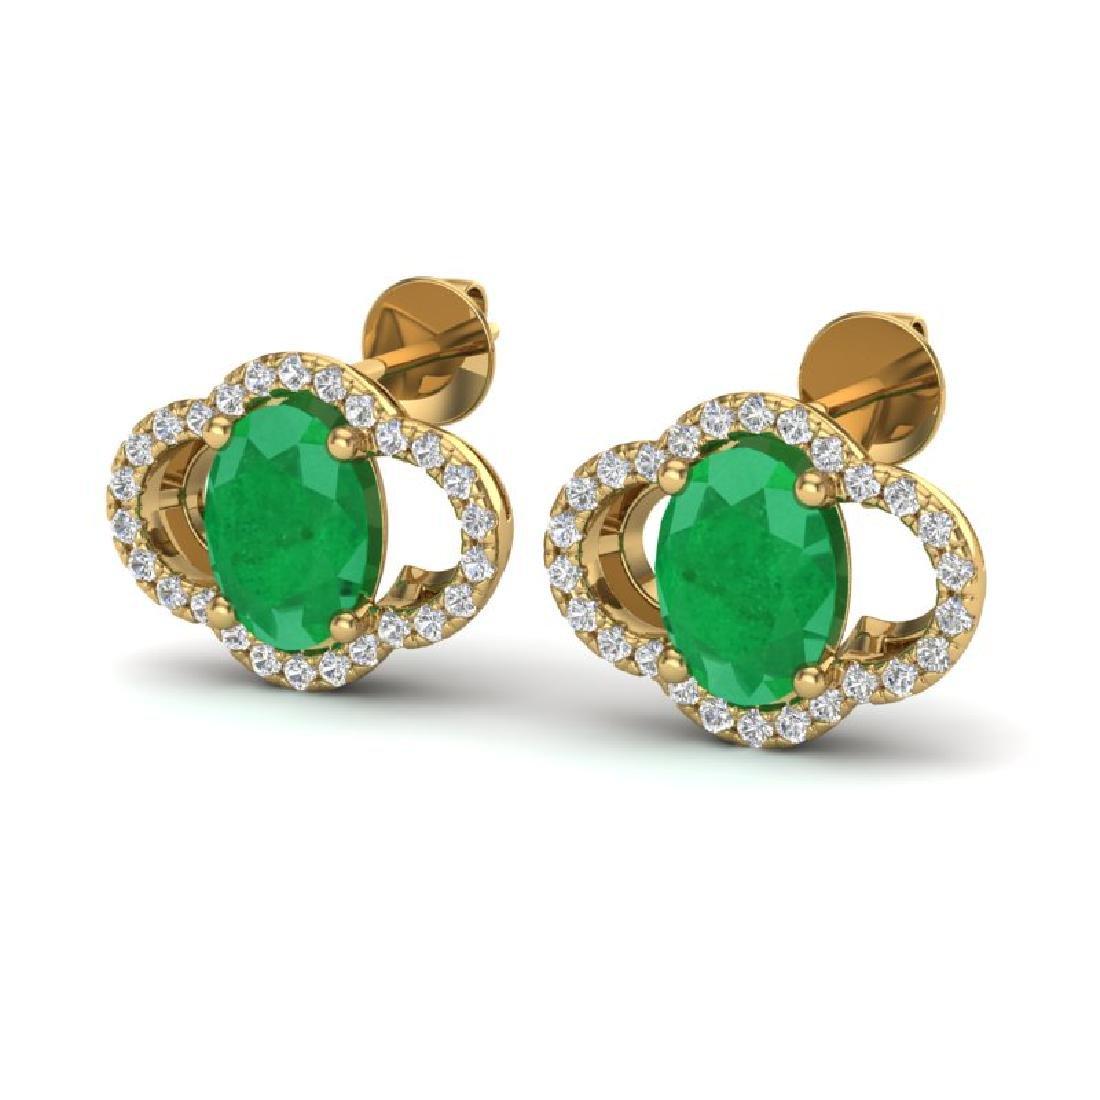 4 CTW Emerald & Micro Pave VS/SI Diamond Earrings 10K